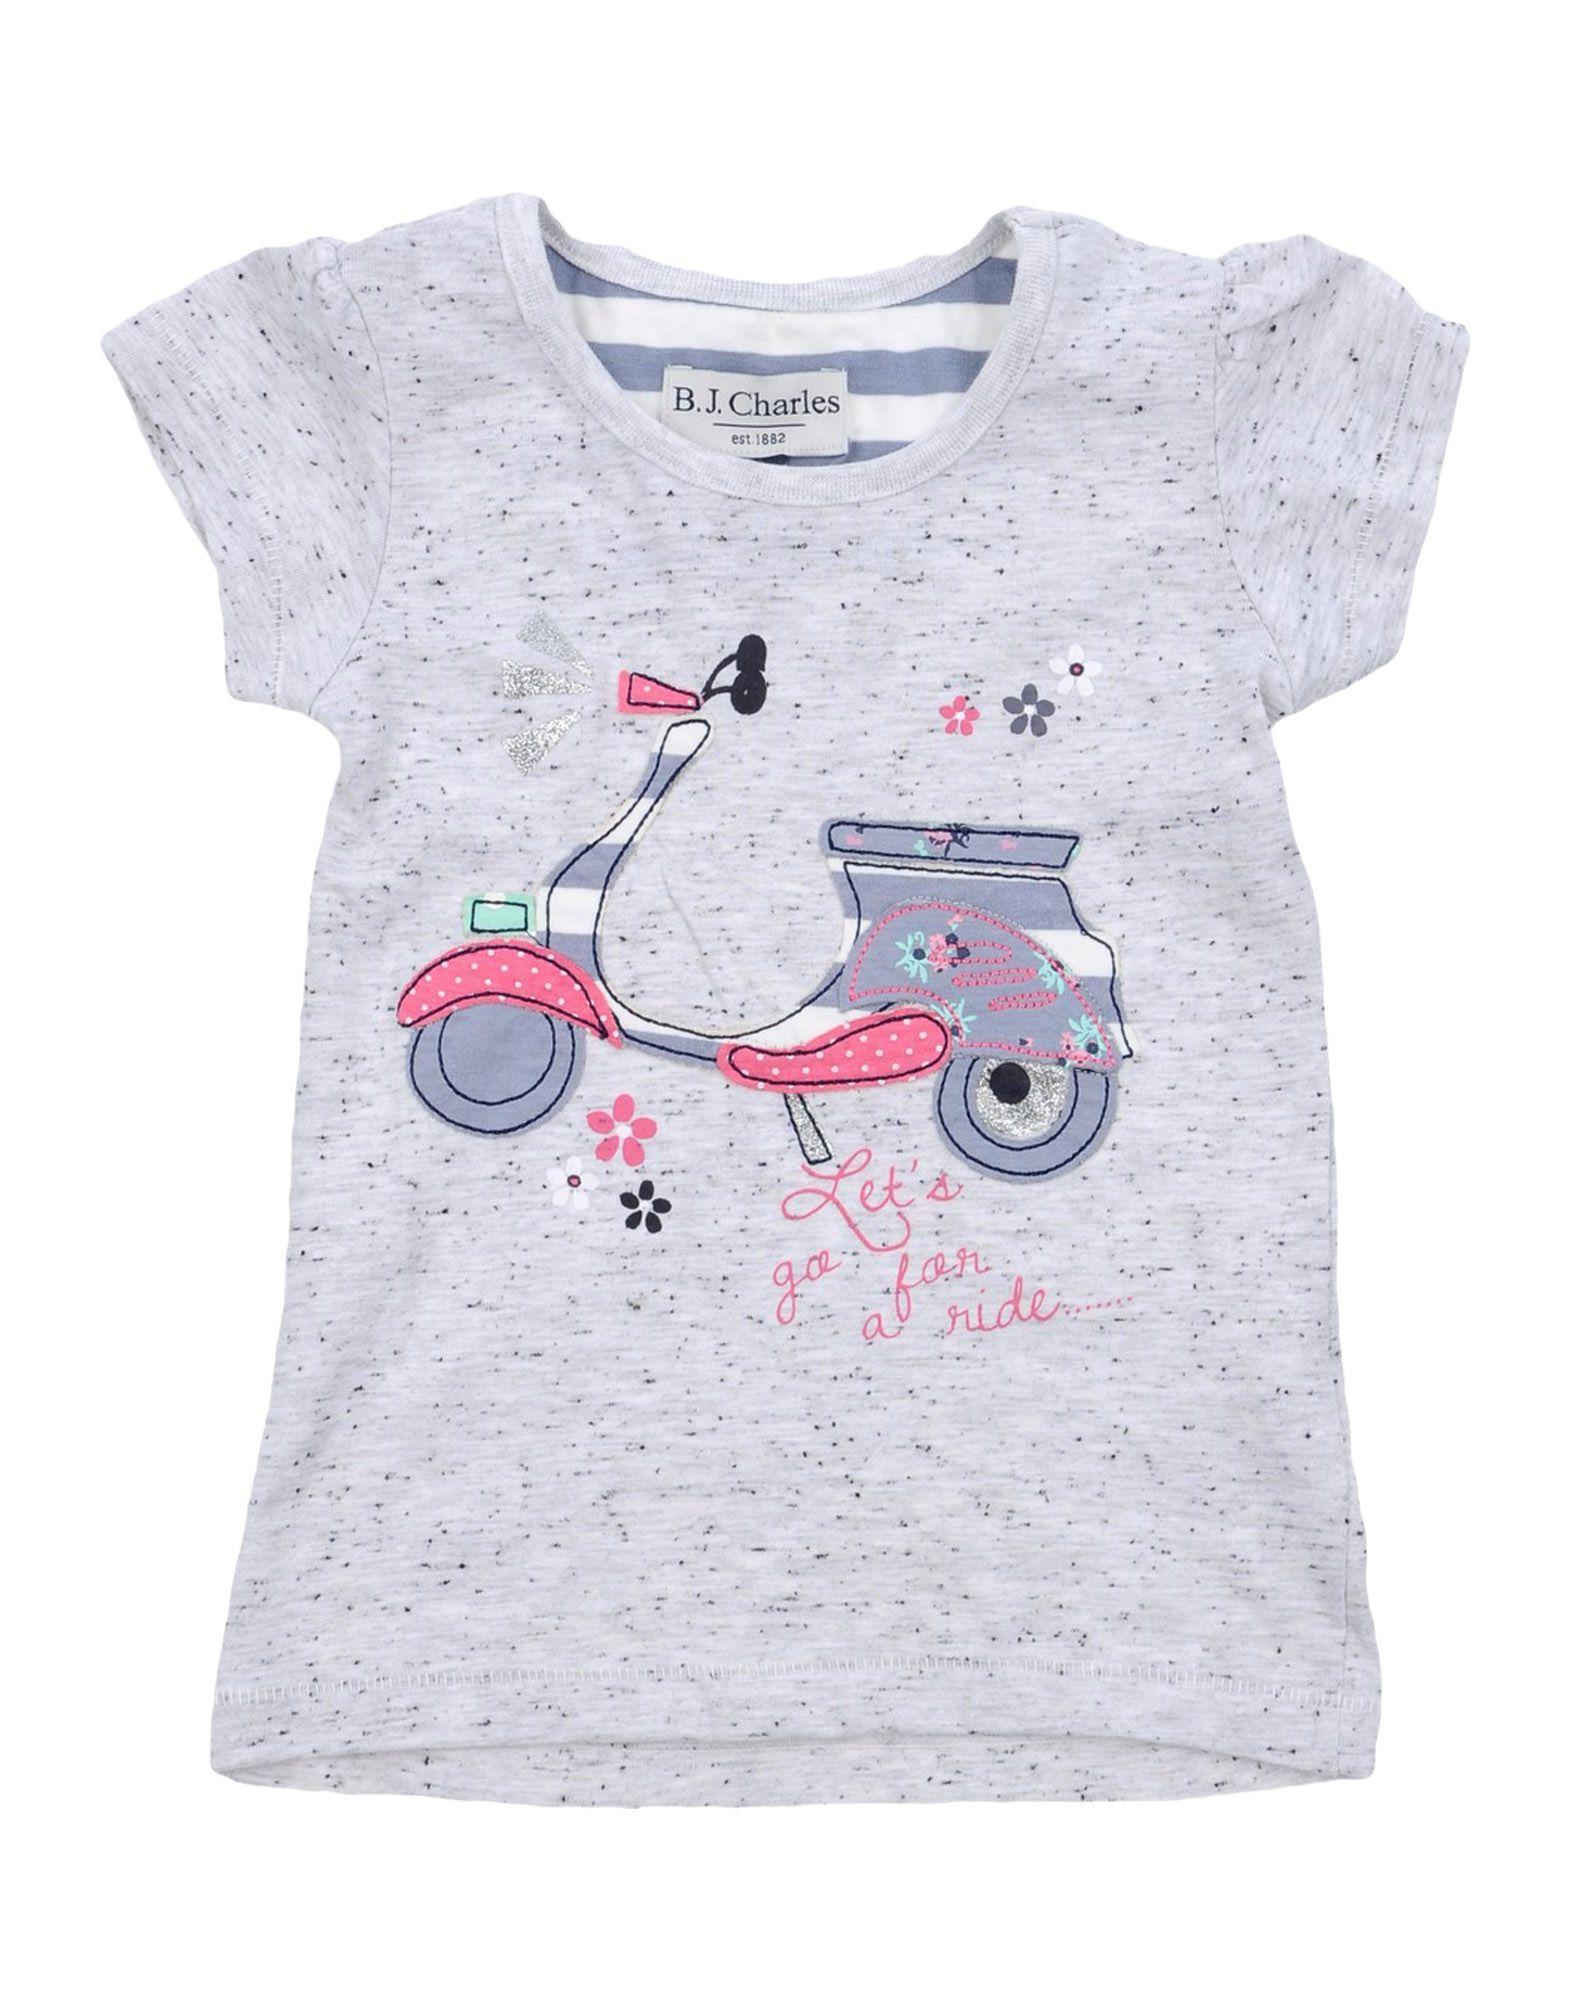 B.j.charles Kids' T-shirts In Light Grey